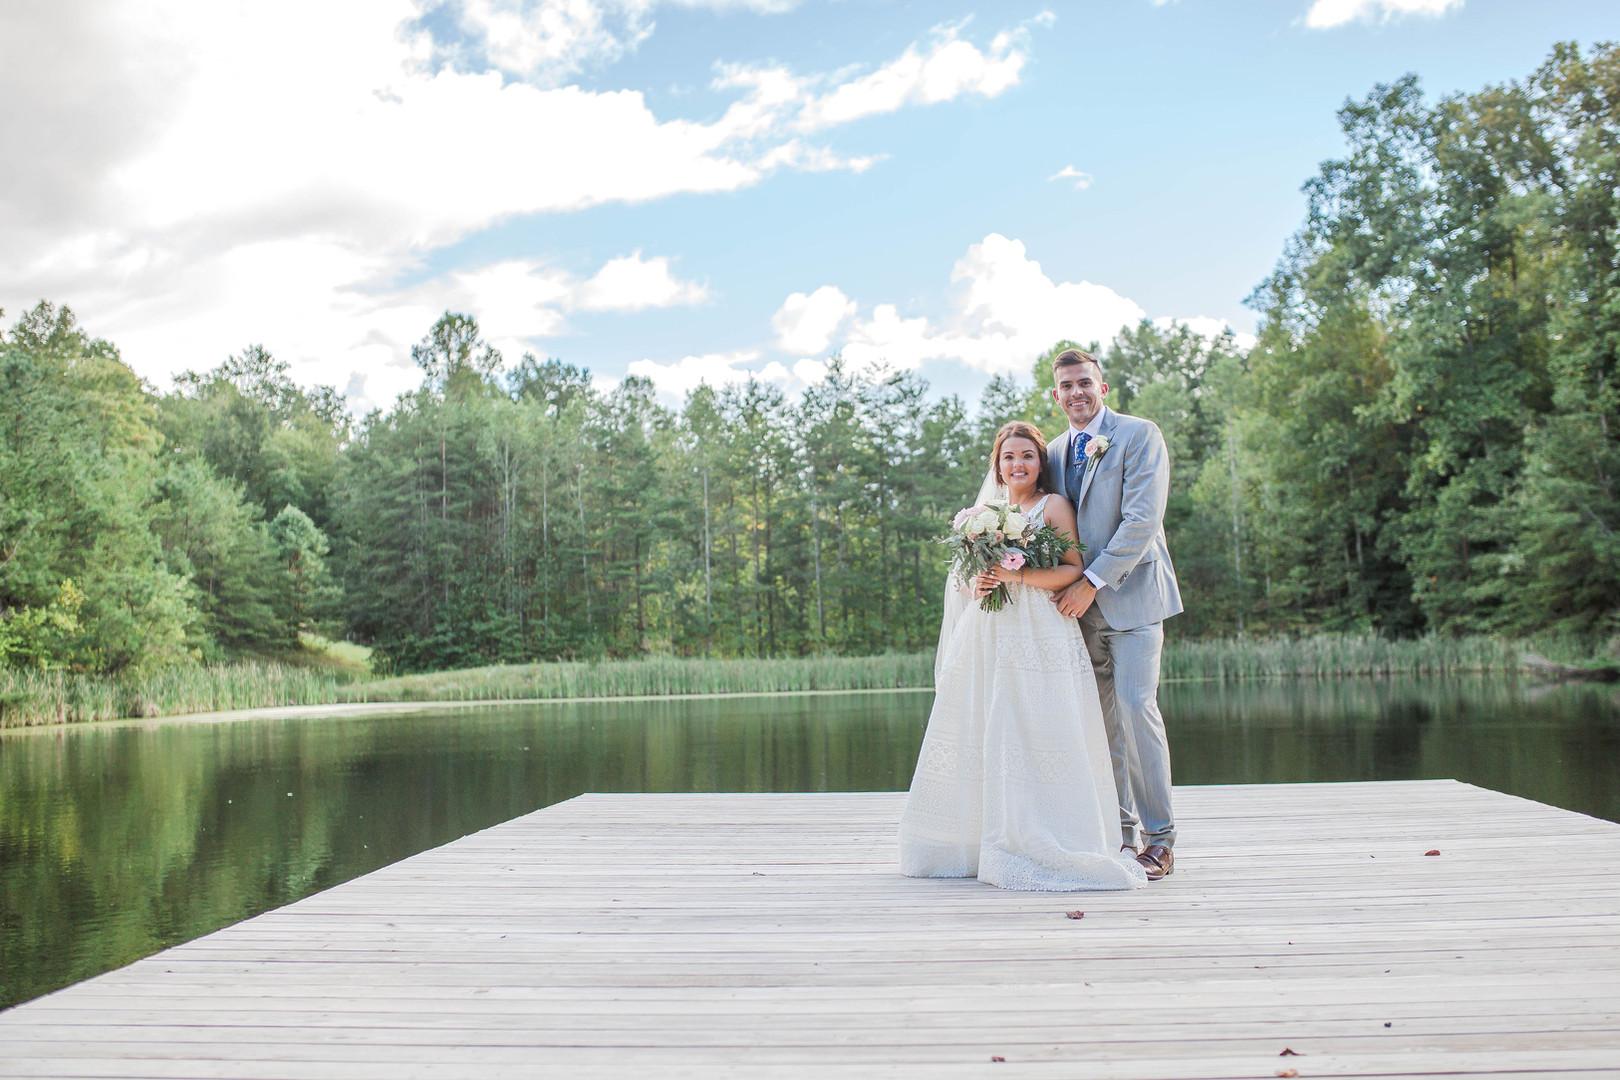 Bride & Groom lower pond pose